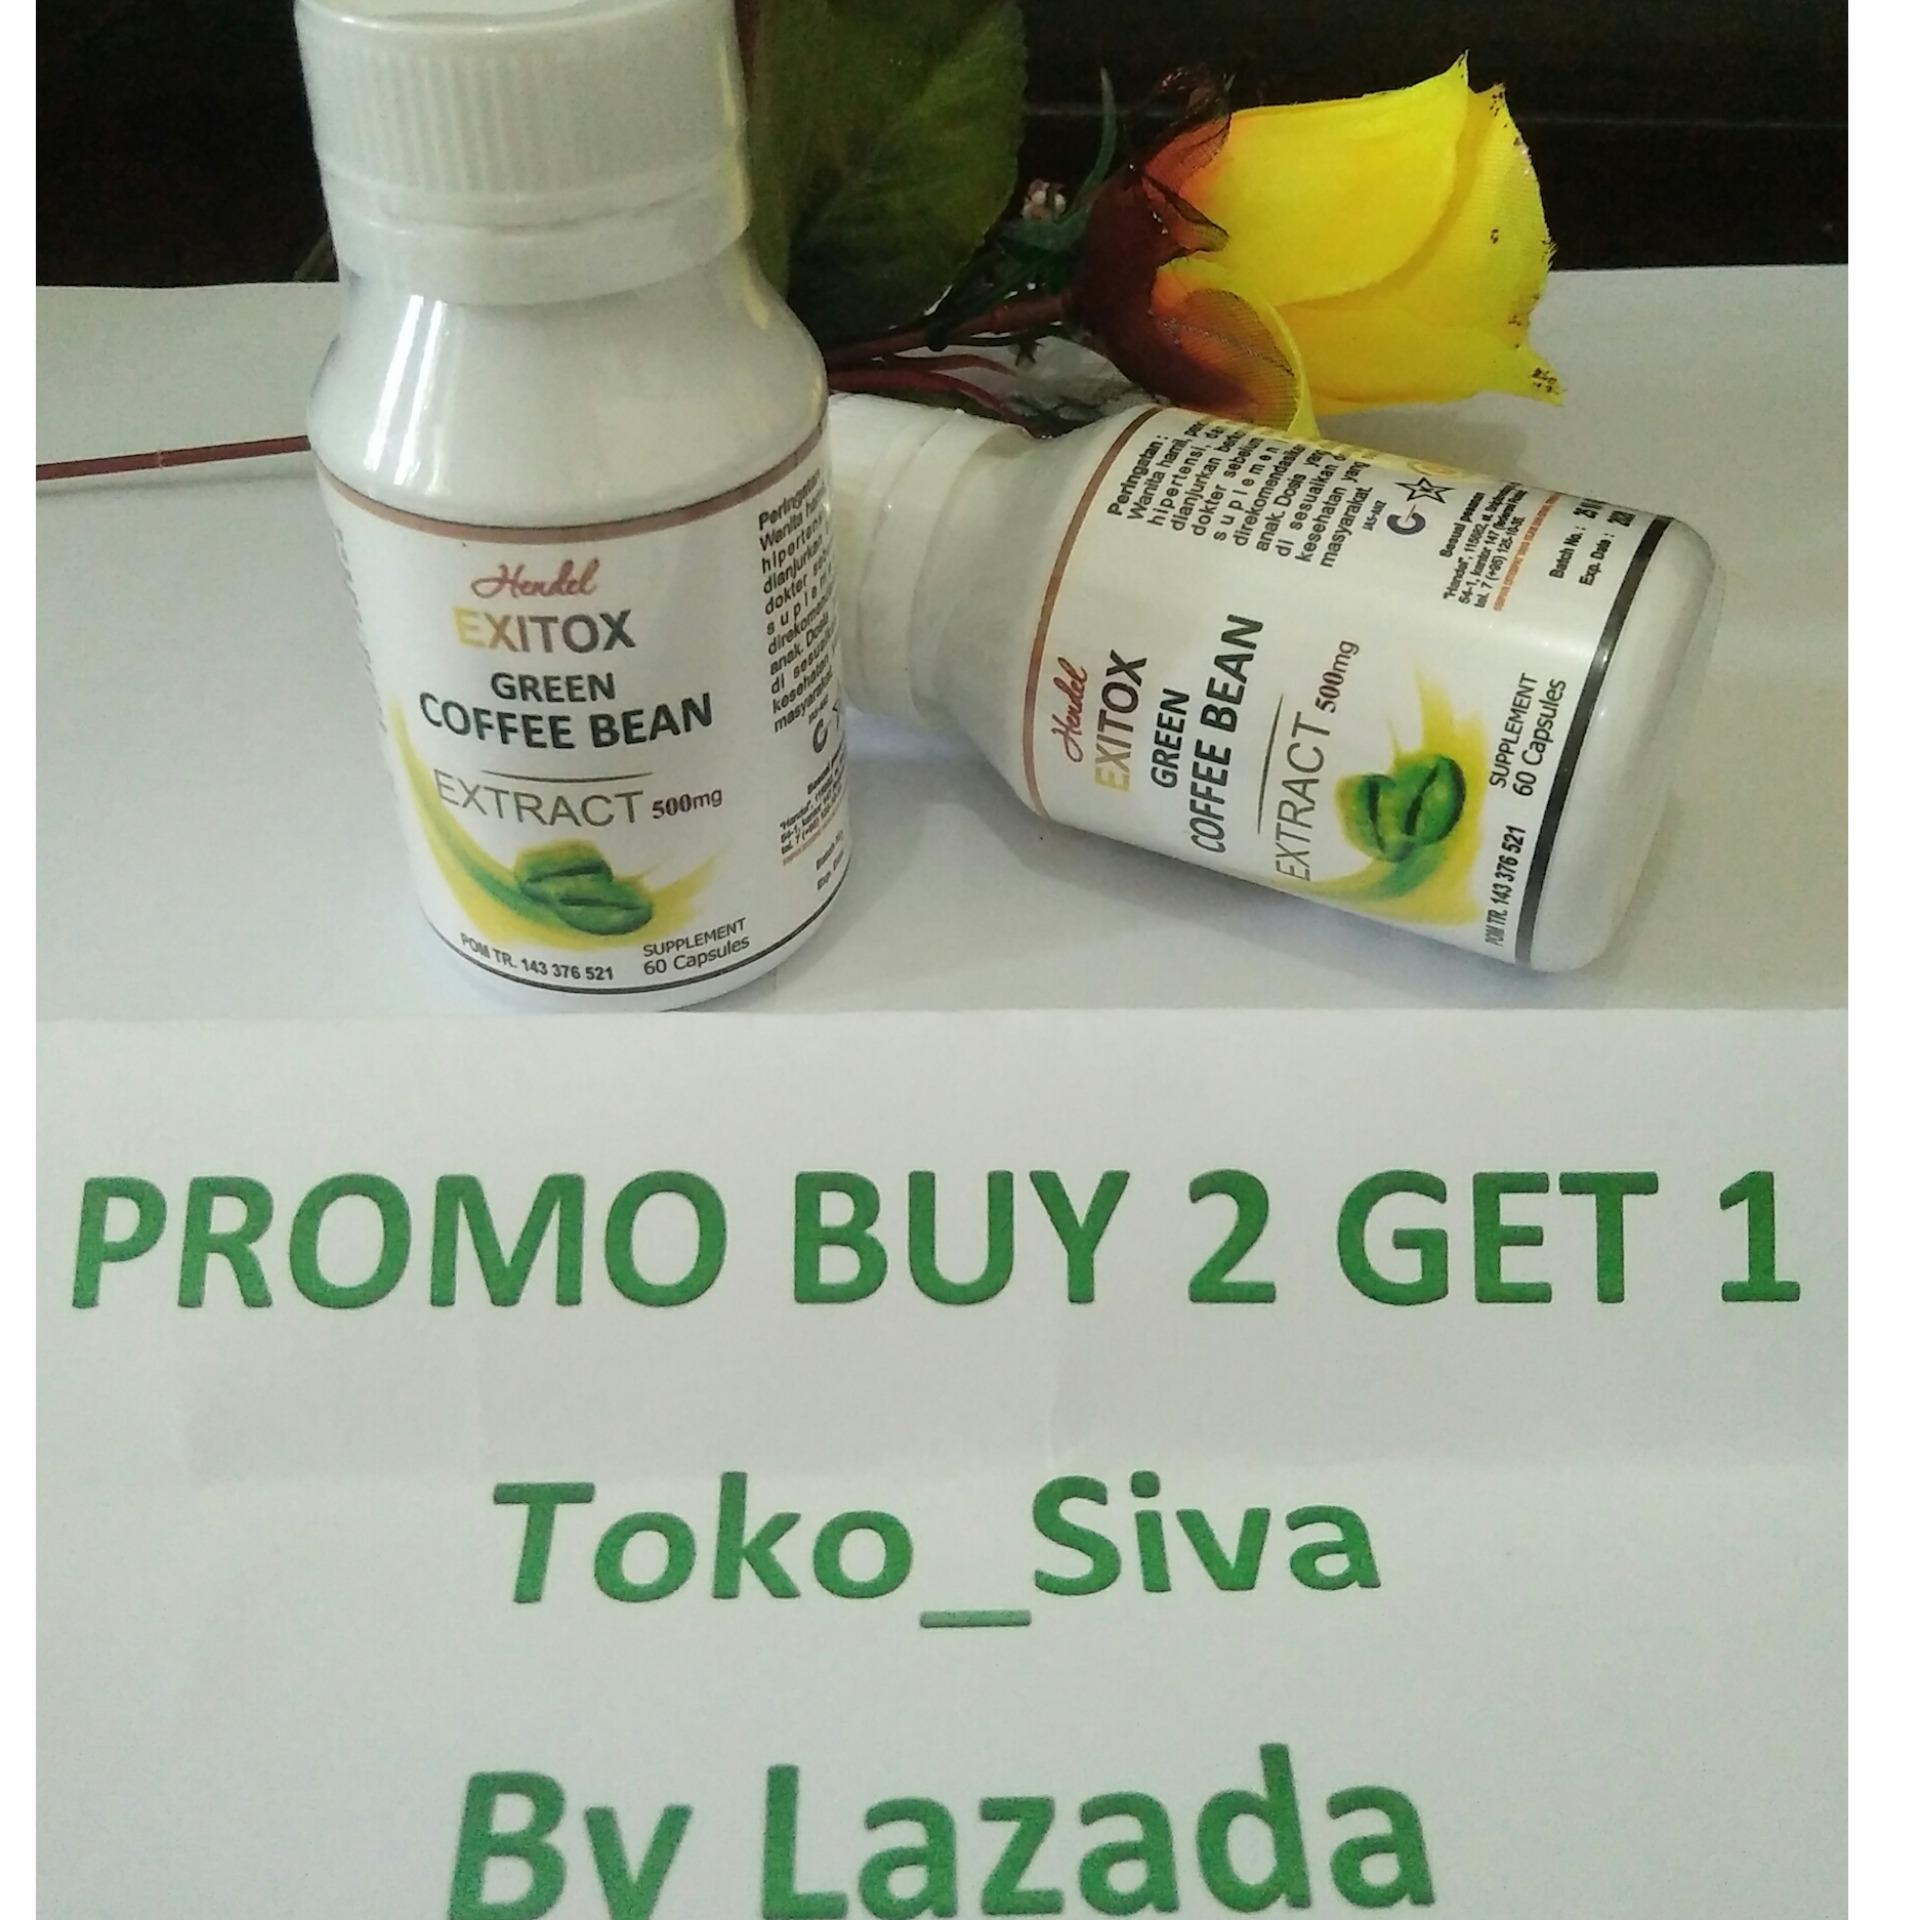 Green Coffee Bean Hendel Exitox 30 Kapsul Detox Pelangsing Detoks Extract Ashsihah Original Exitok 60 Badan Herbal Alami Lazada Indonesia